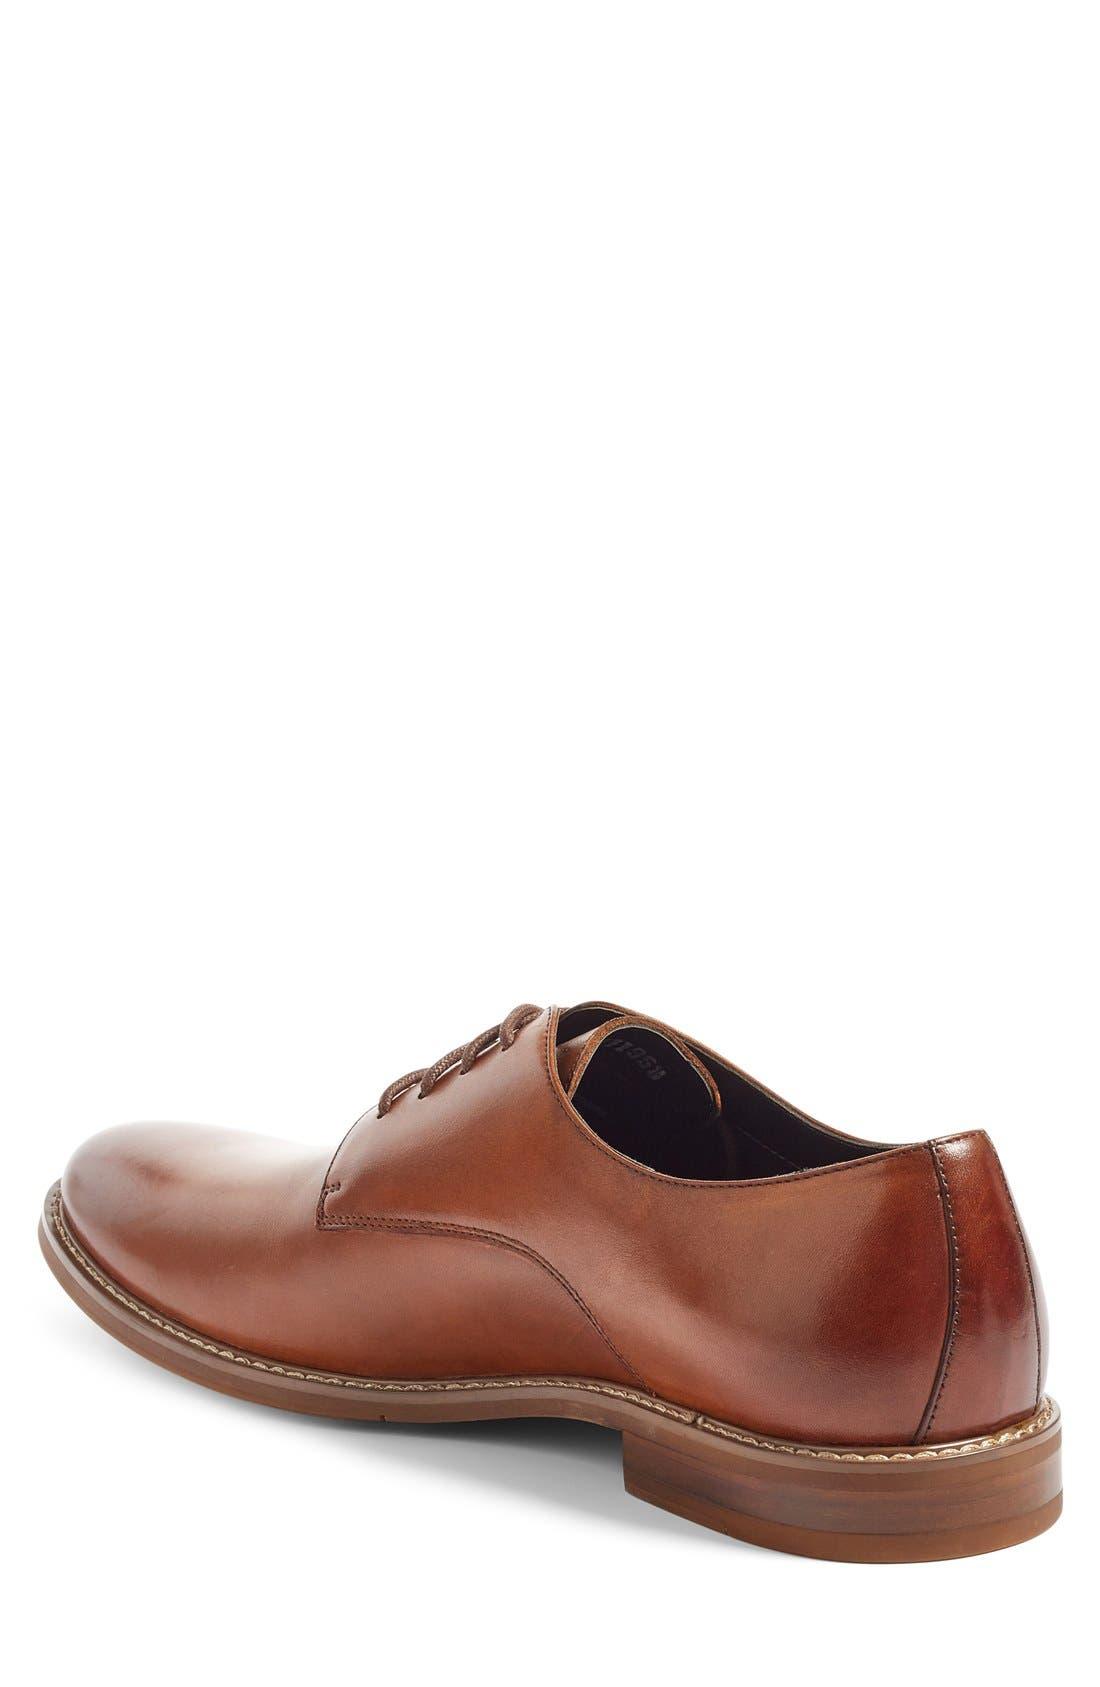 Everett Plain Toe Derby,                             Alternate thumbnail 2, color,                             Tan Leather